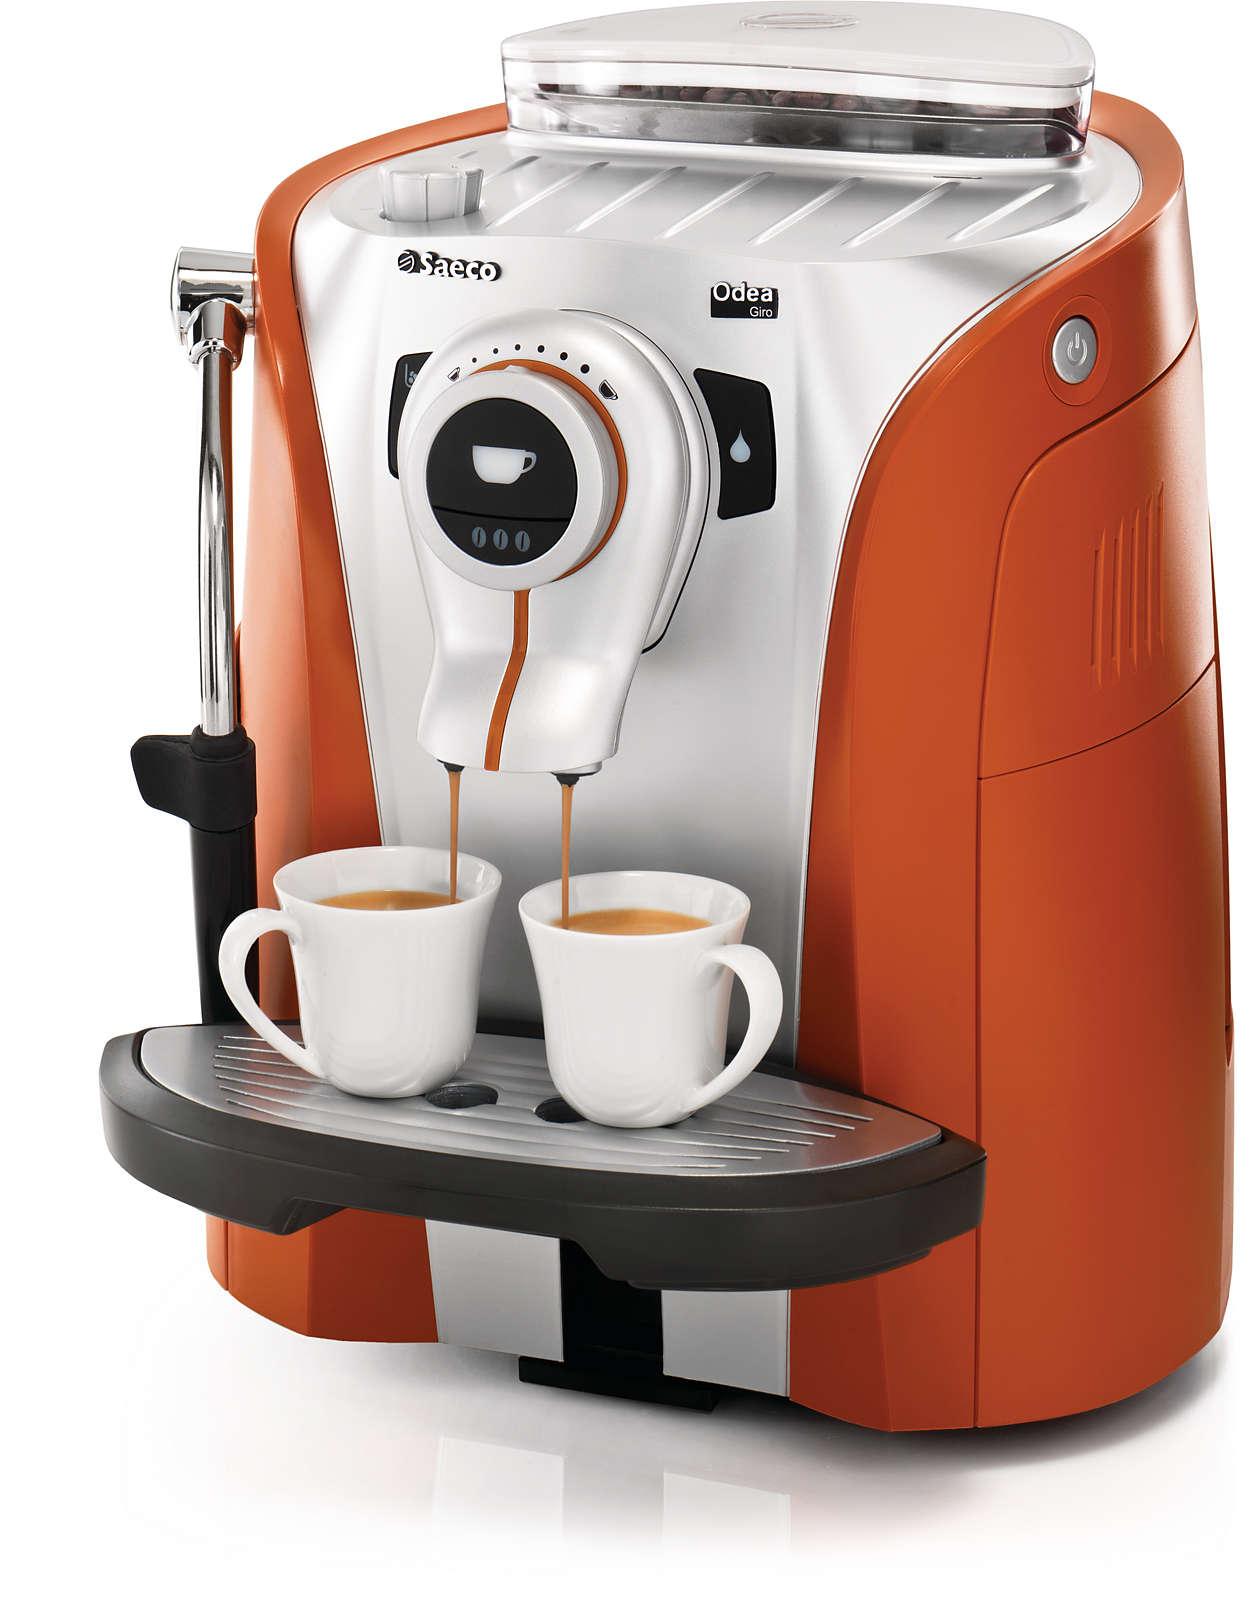 odea machine espresso automatique ri9754 21 saeco. Black Bedroom Furniture Sets. Home Design Ideas